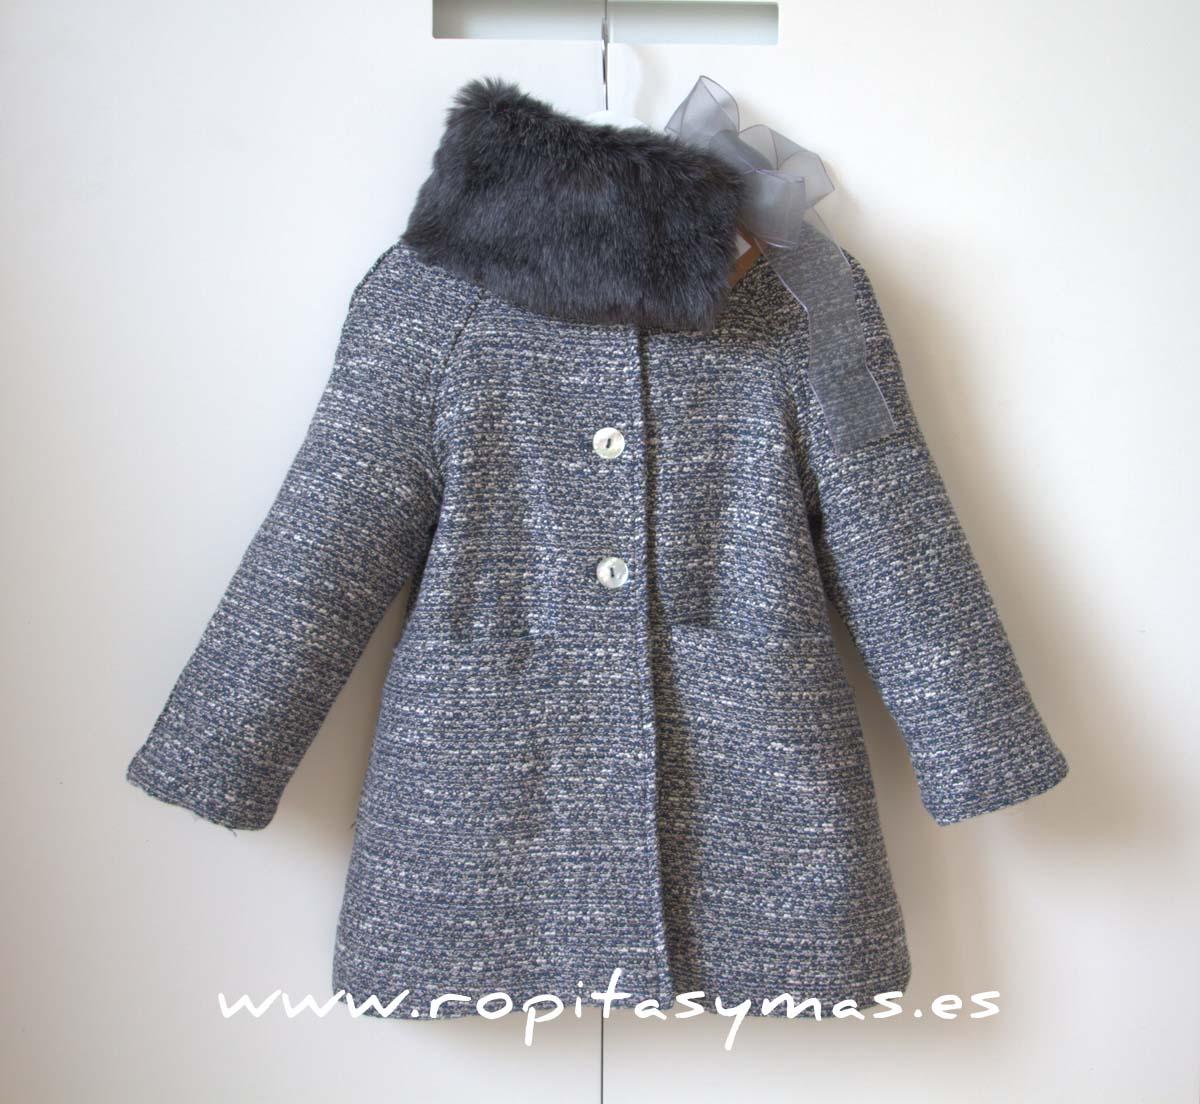 W16-ANCAR6000 abrigos